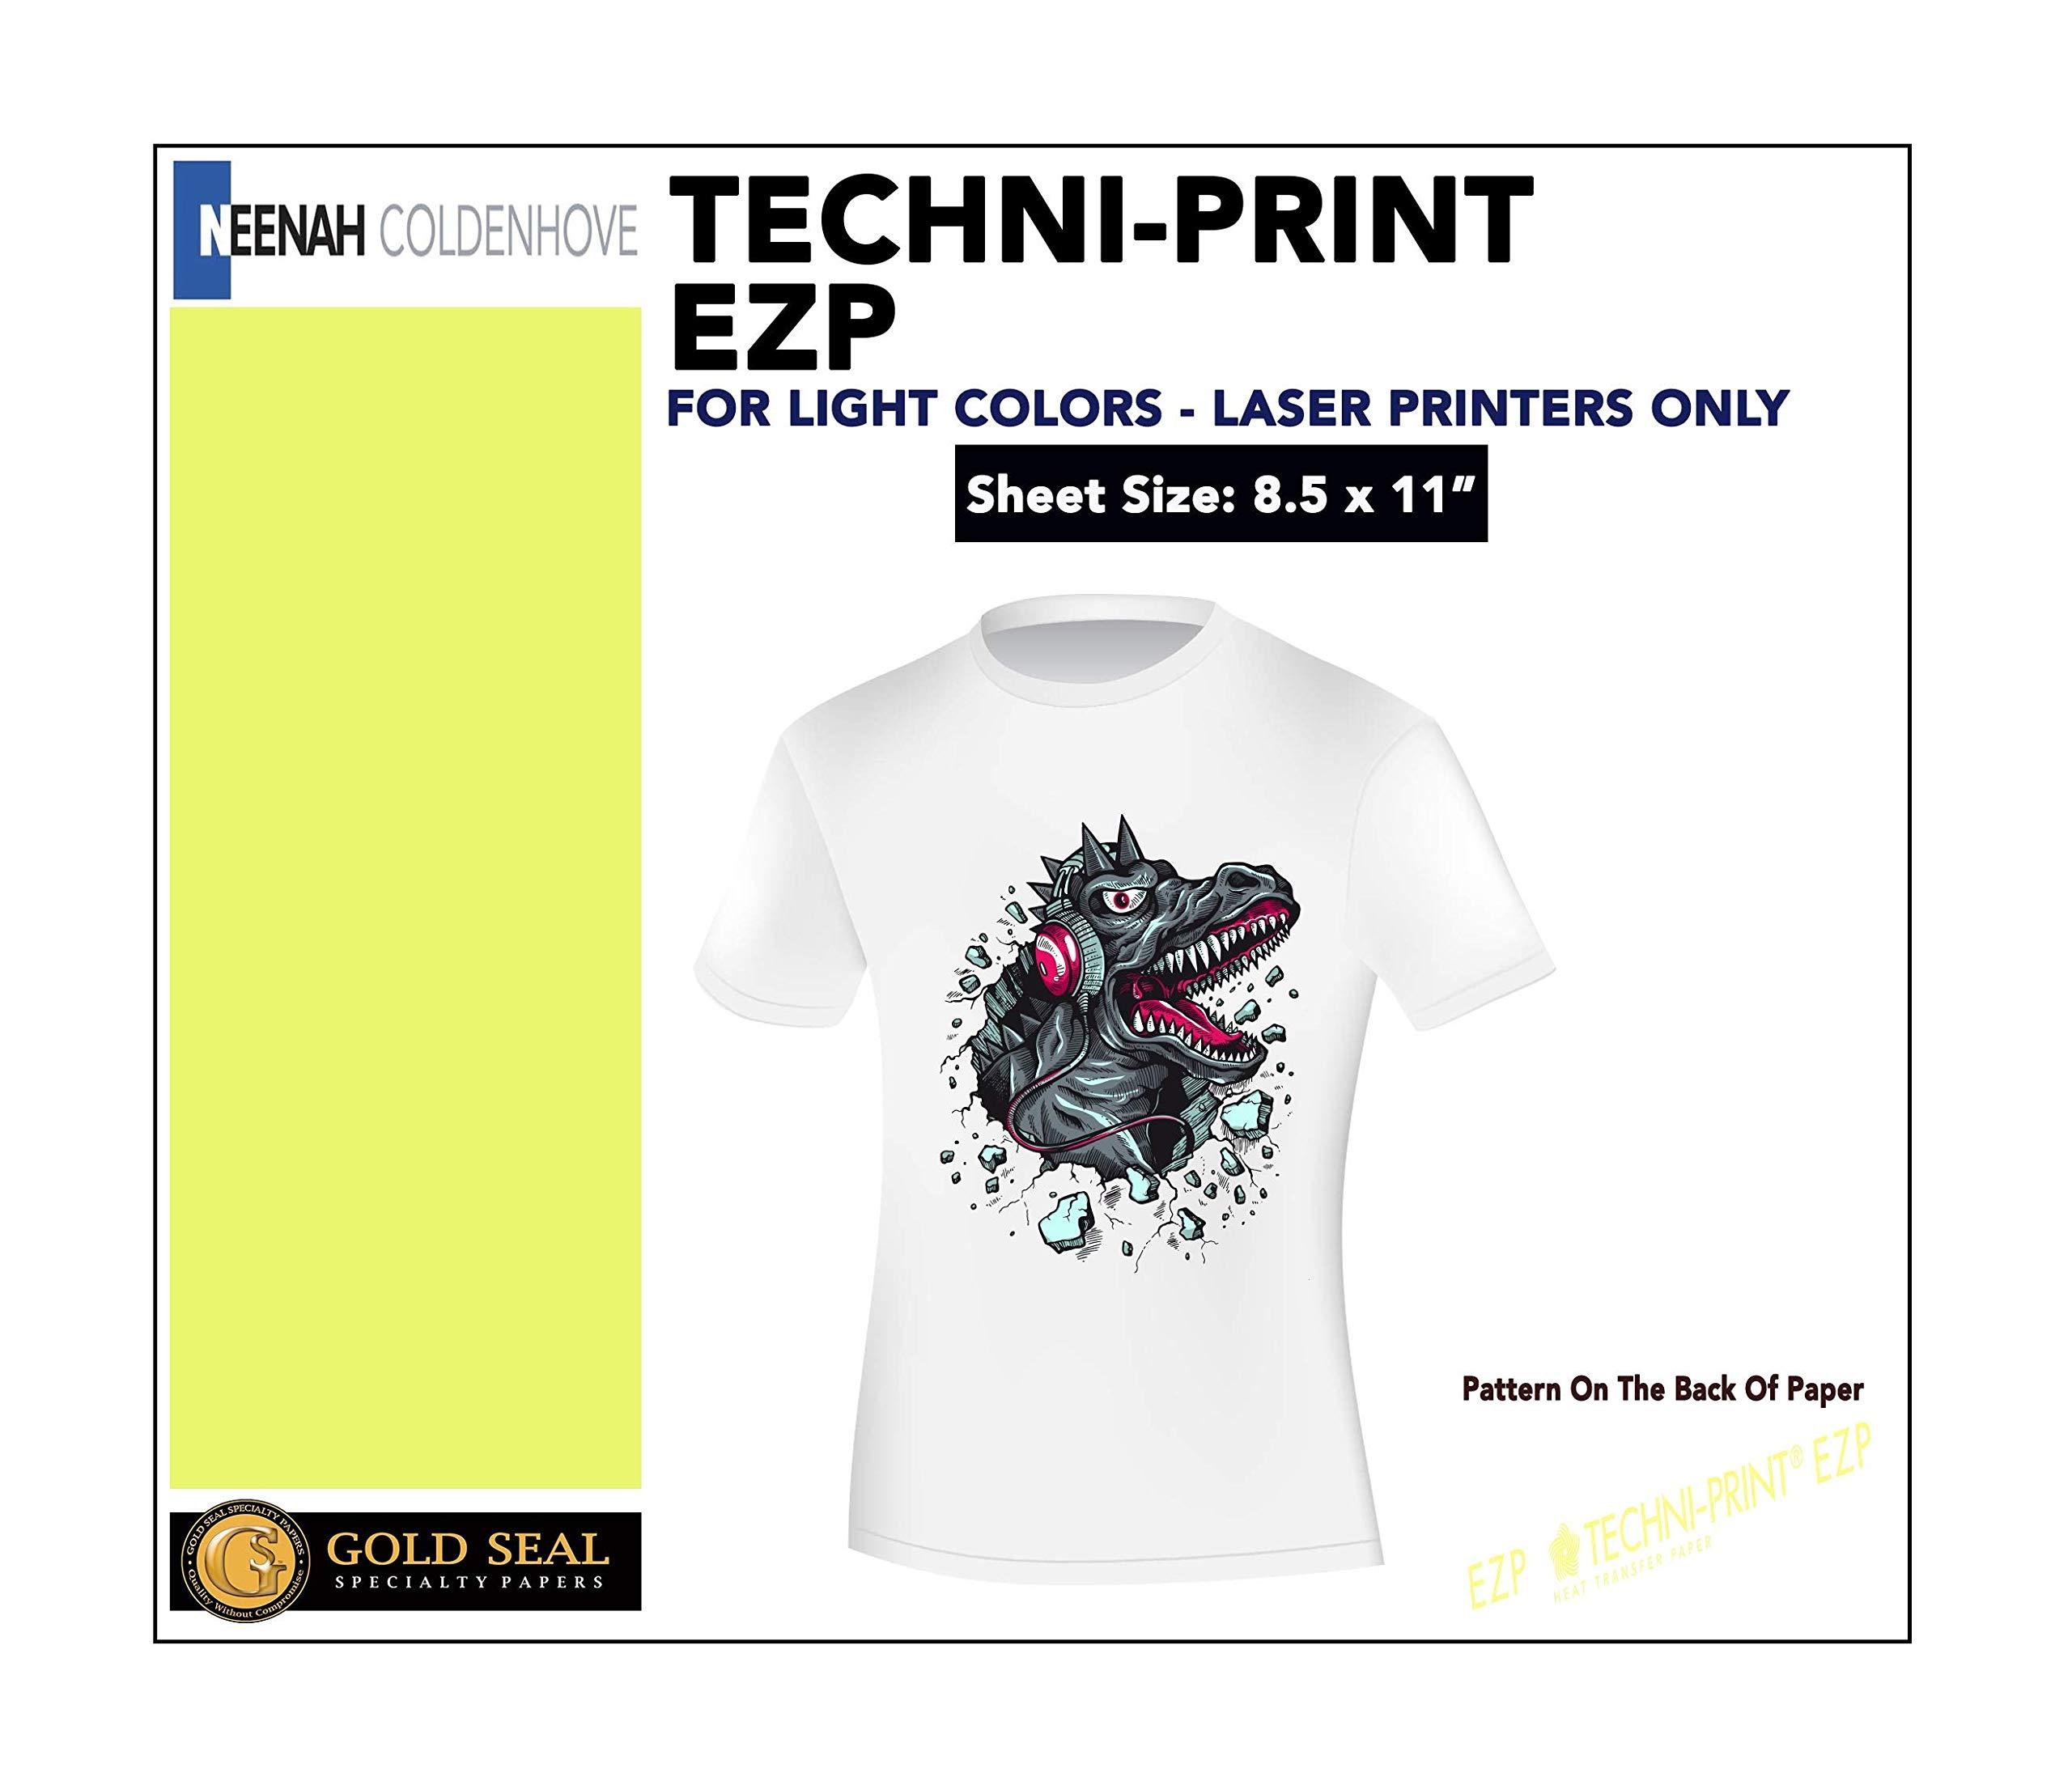 Neenah TECHNI-PRINT EZP, 8.5'' x 11'', 50 Sheet Pack